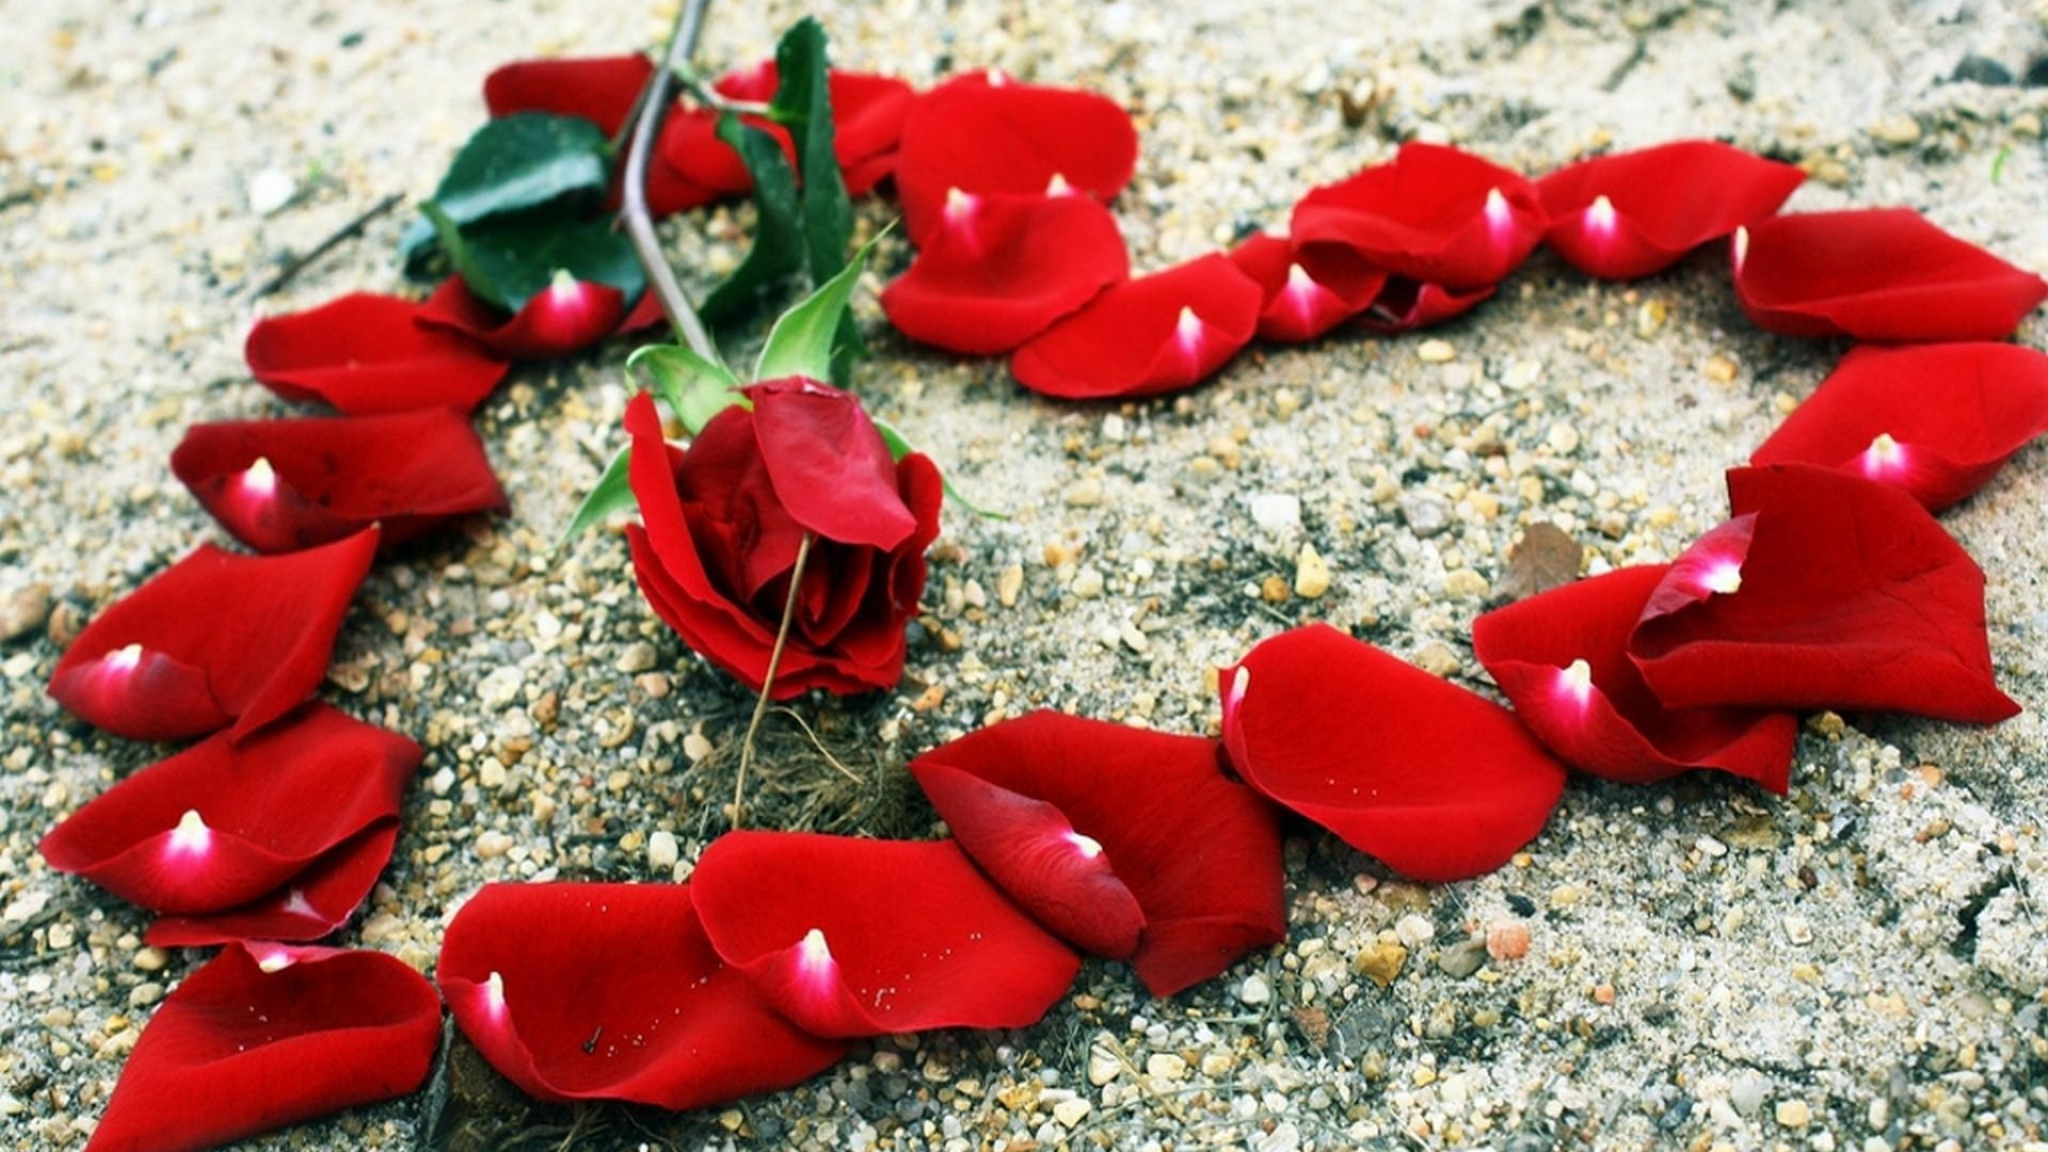 roza_lepestki_serdce_kamni_romantika_66803_2048x1152-1